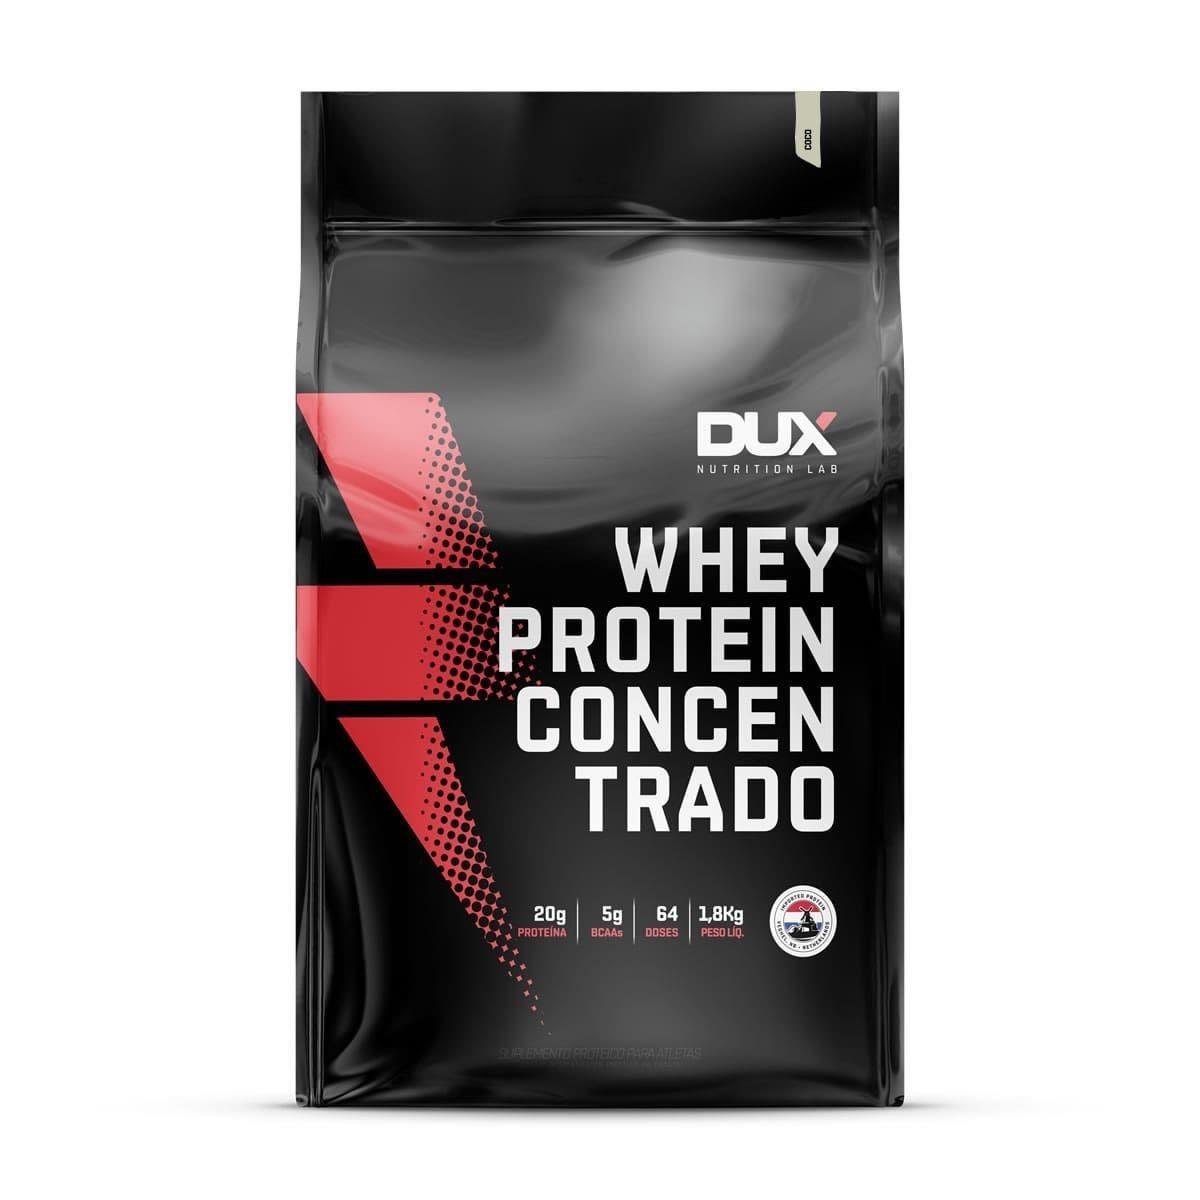 Whey Protein Concentrado (1800g) Coco DUX